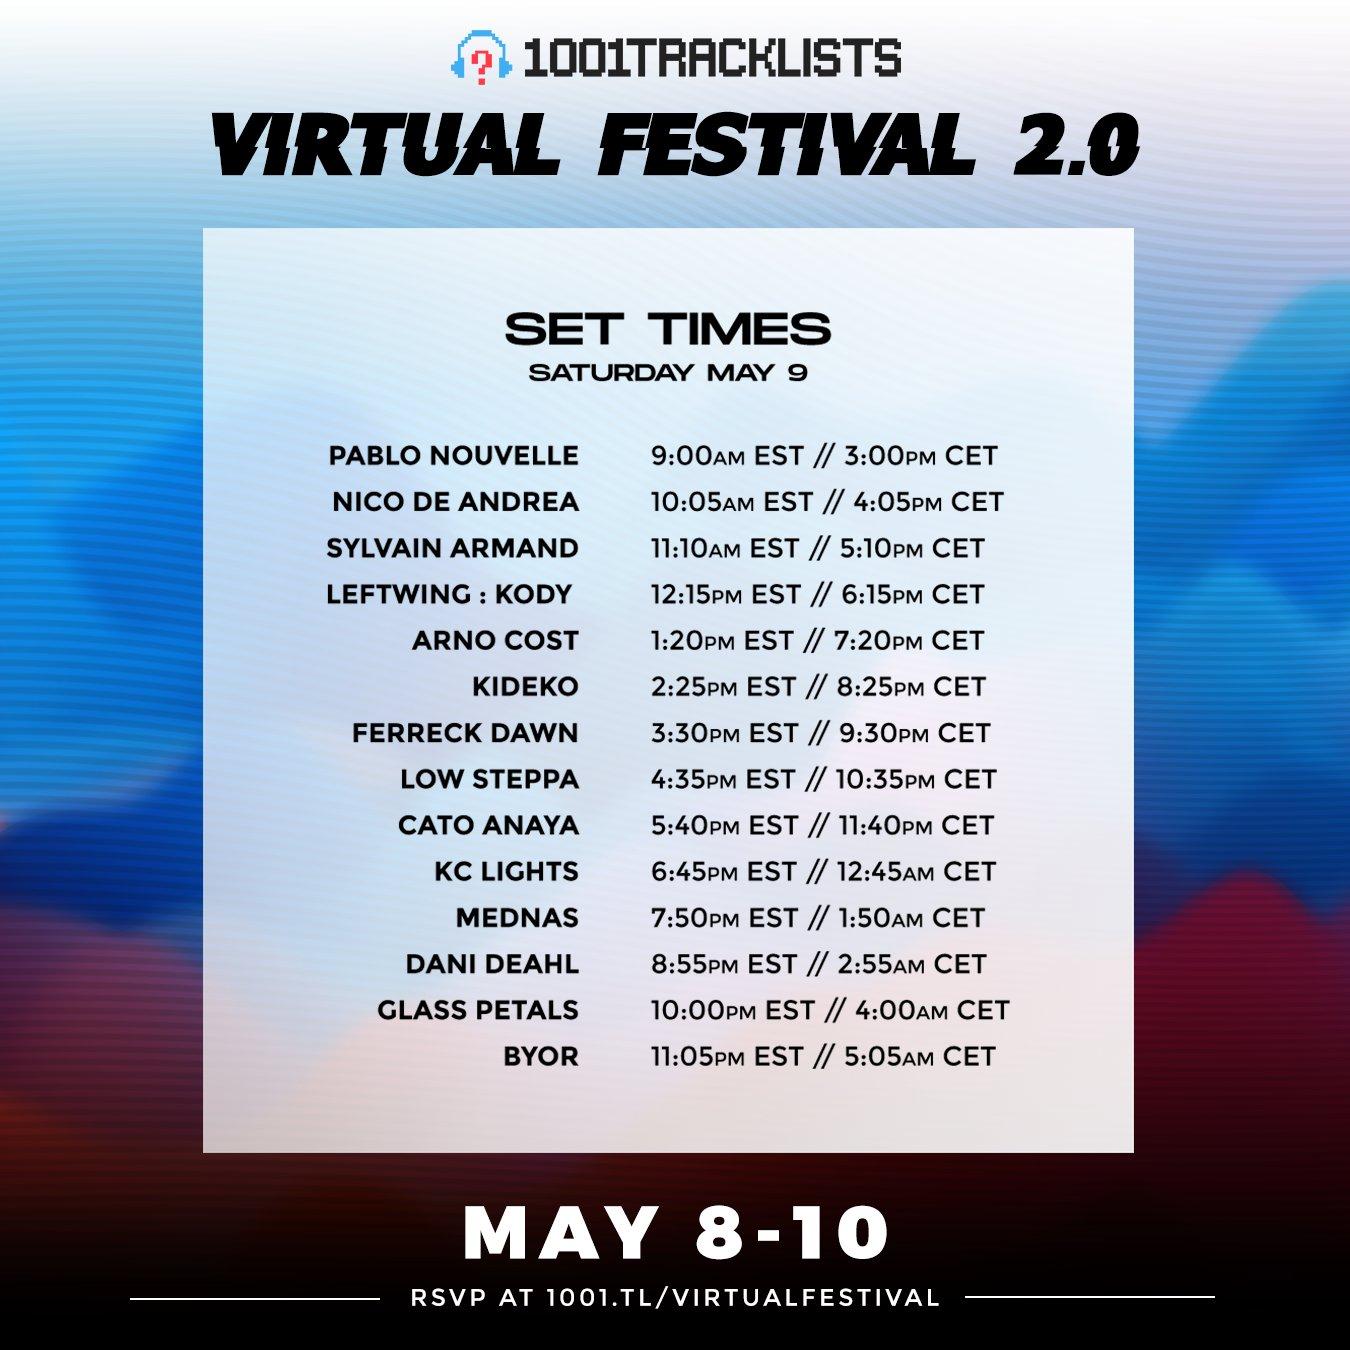 1001Tracklists Virtual Festival Schedule - Saturday